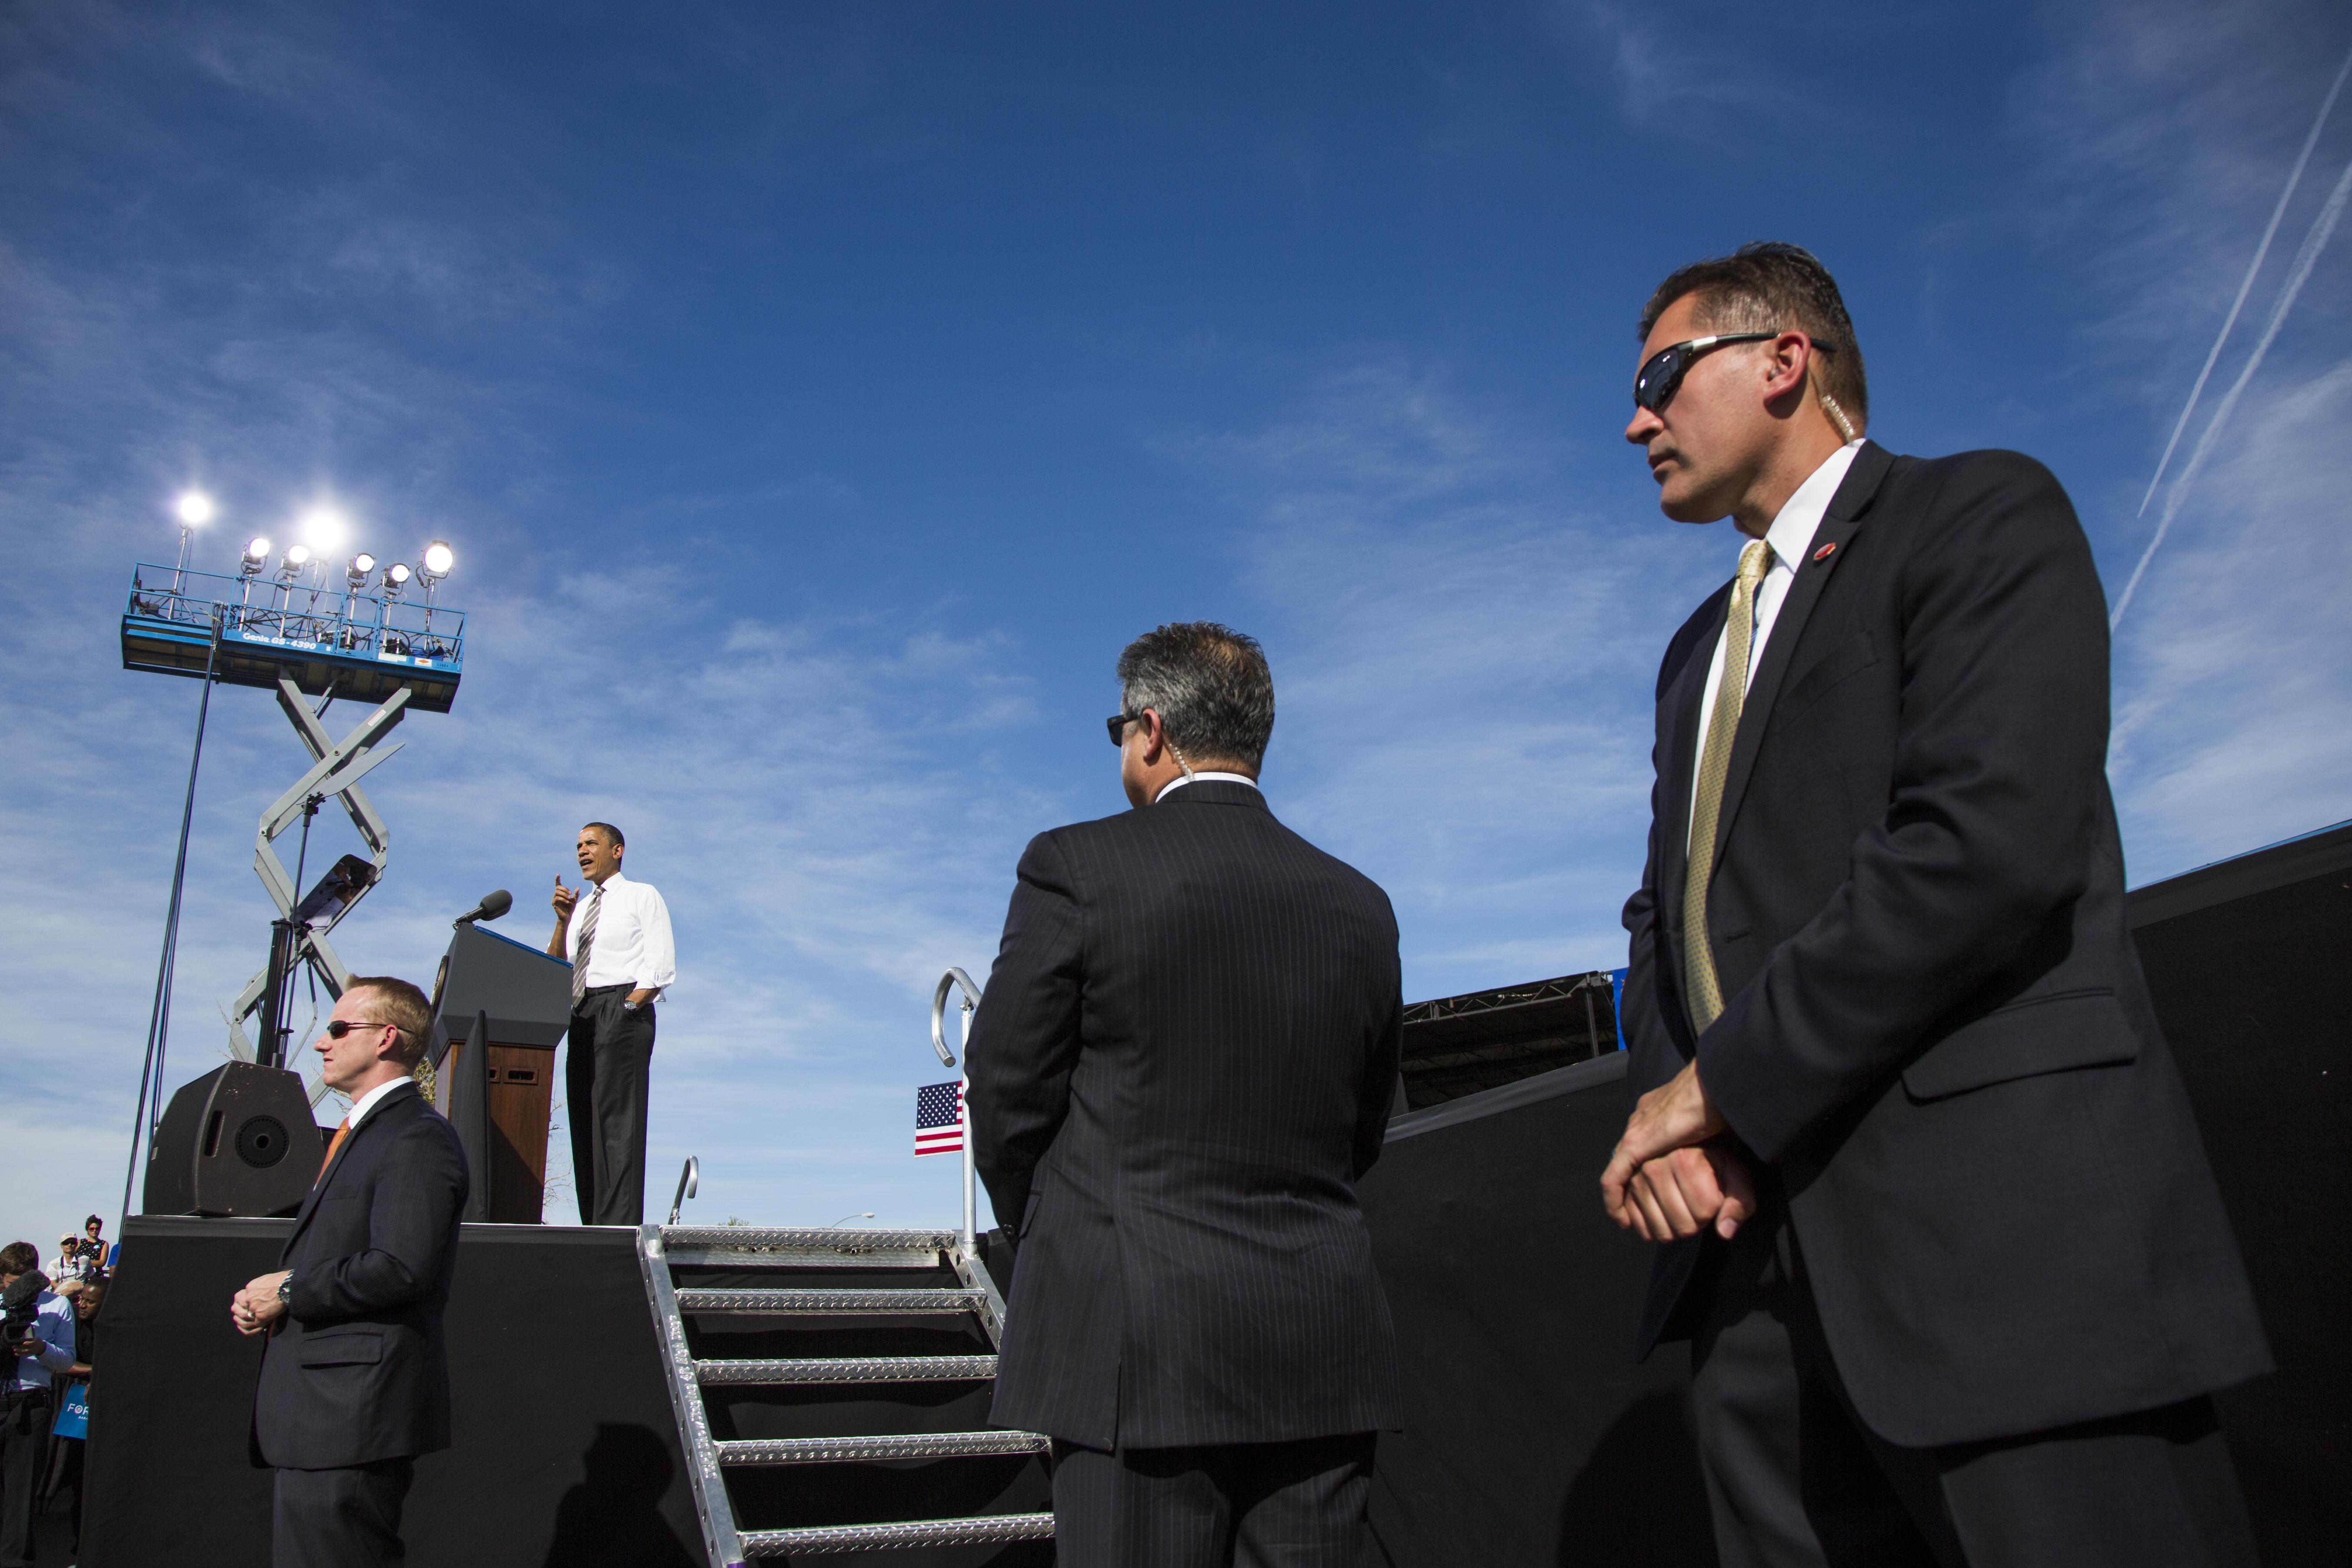 Secret Service agents surround U.S. President Barack Obama at a campaign event in Las Vegas on Nov. 1, 2012.